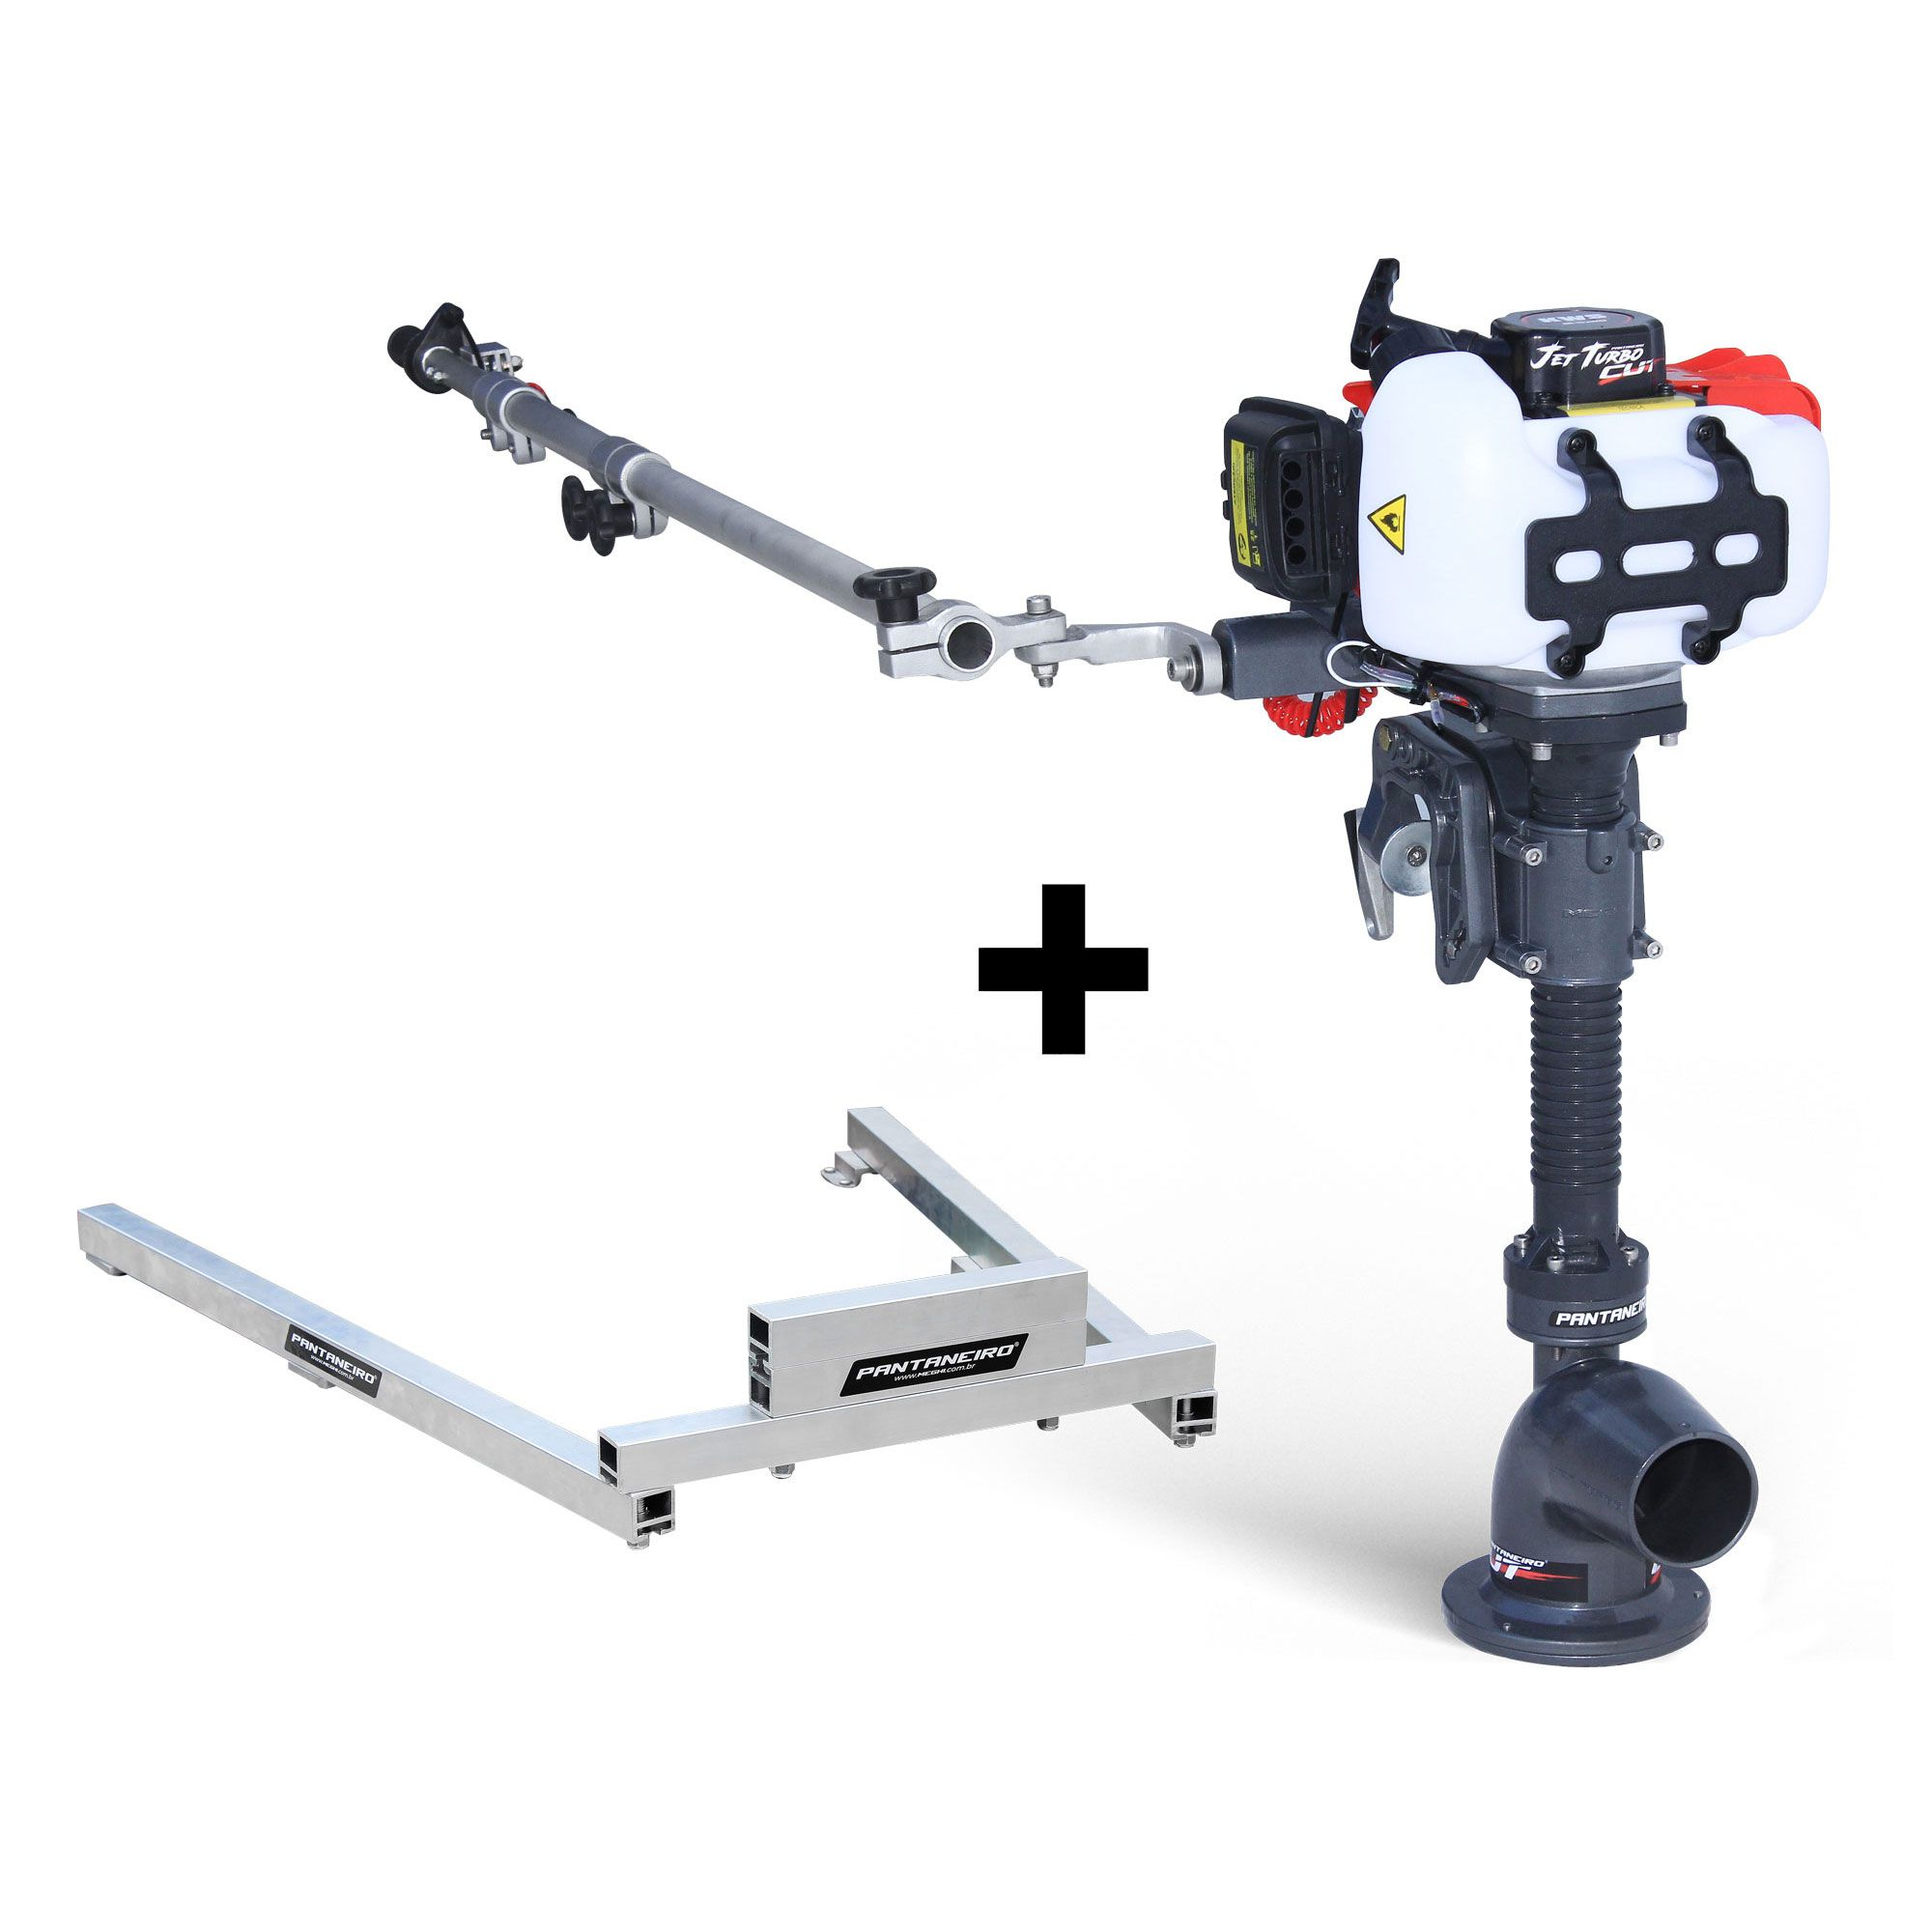 Kit Jet Turbo Cut Pantaneiro + acelerador remoto + Suporte traseiro Hook